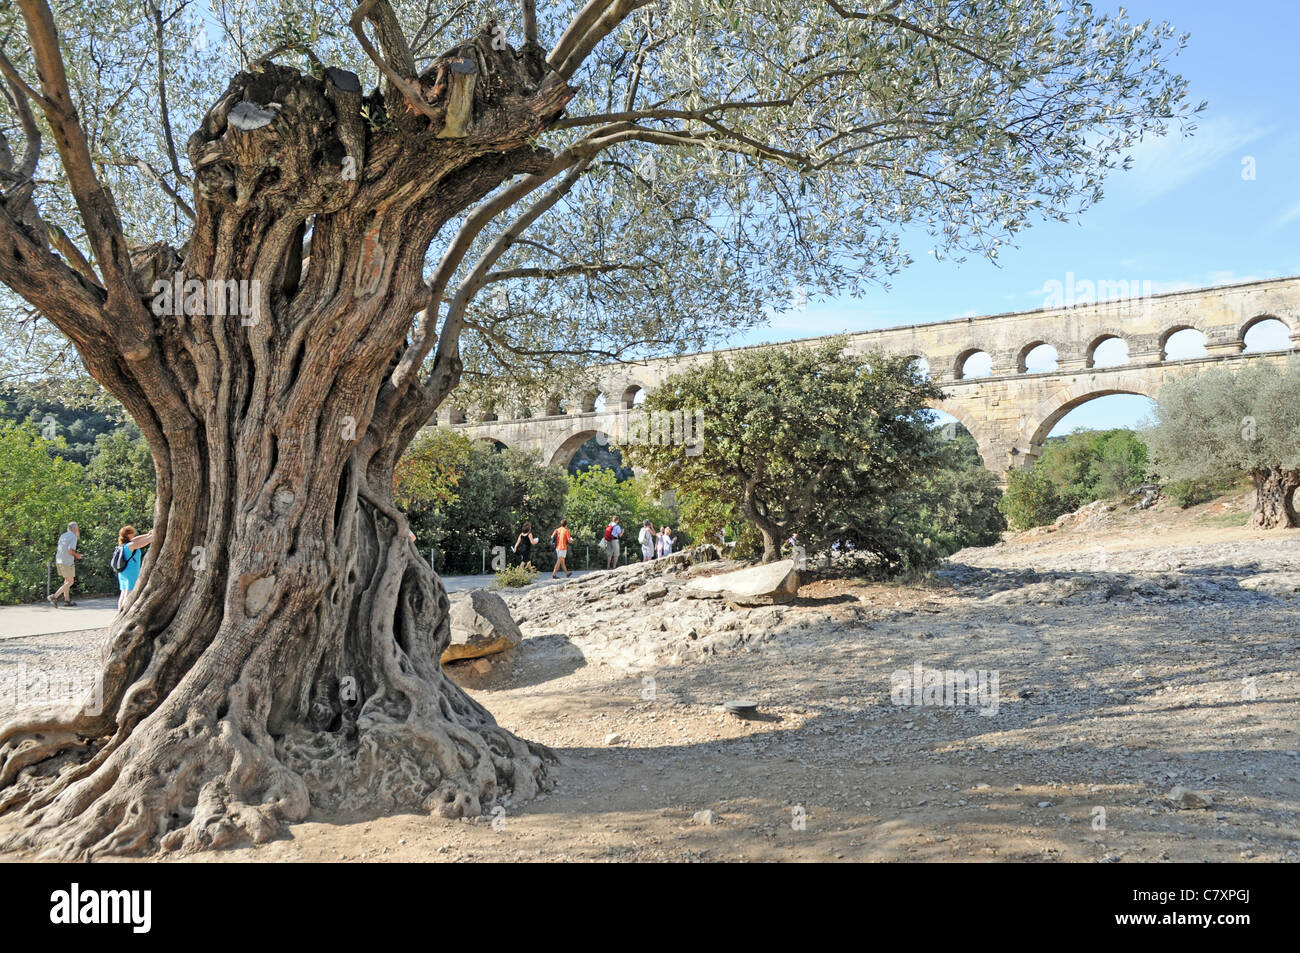 old olive tree ancient roman aqueduct bridge called pont du gard